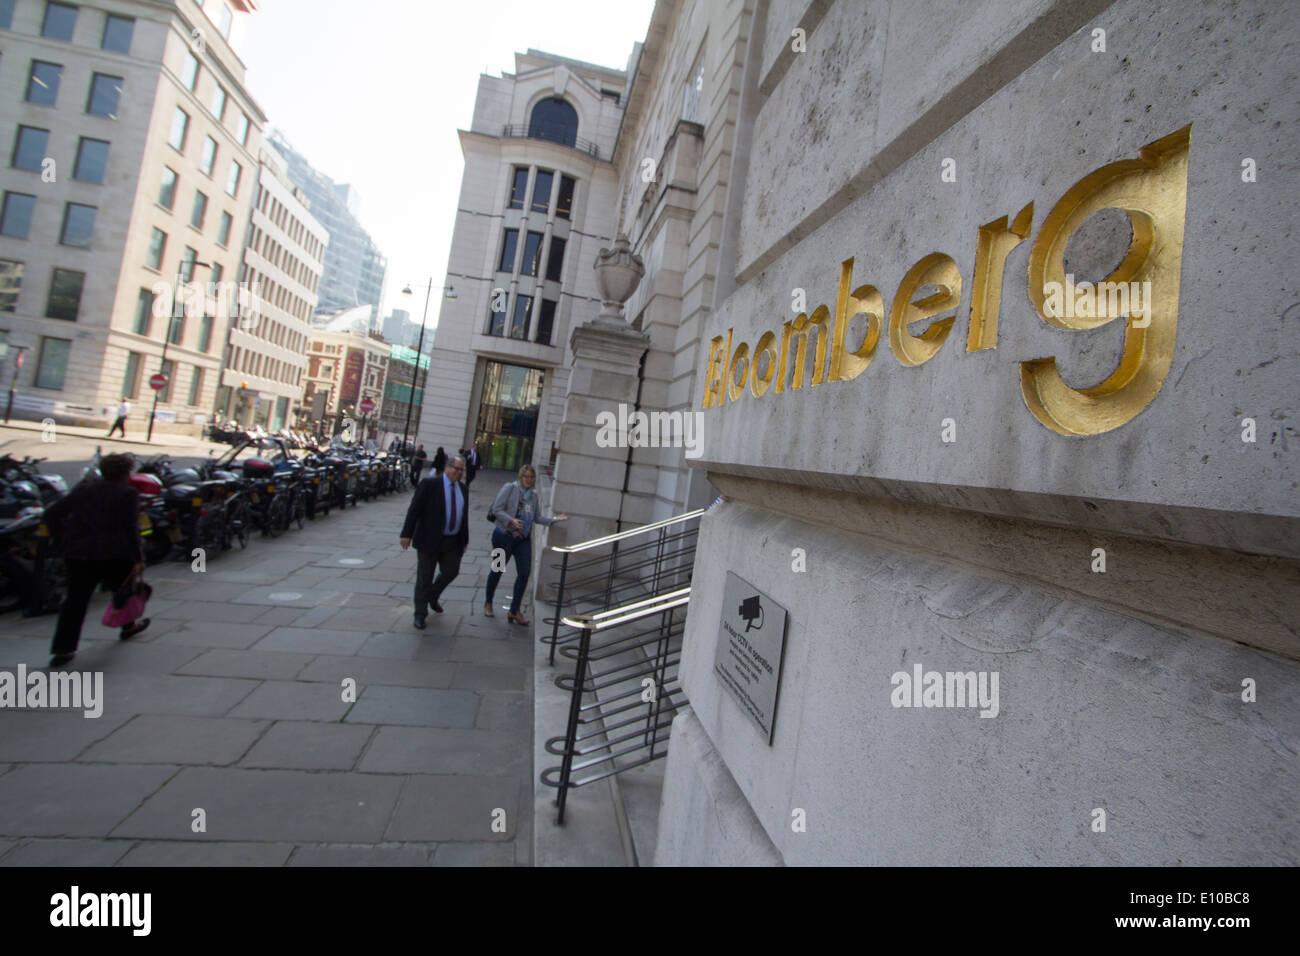 Bloomberg building Headquarters London - Stock Image